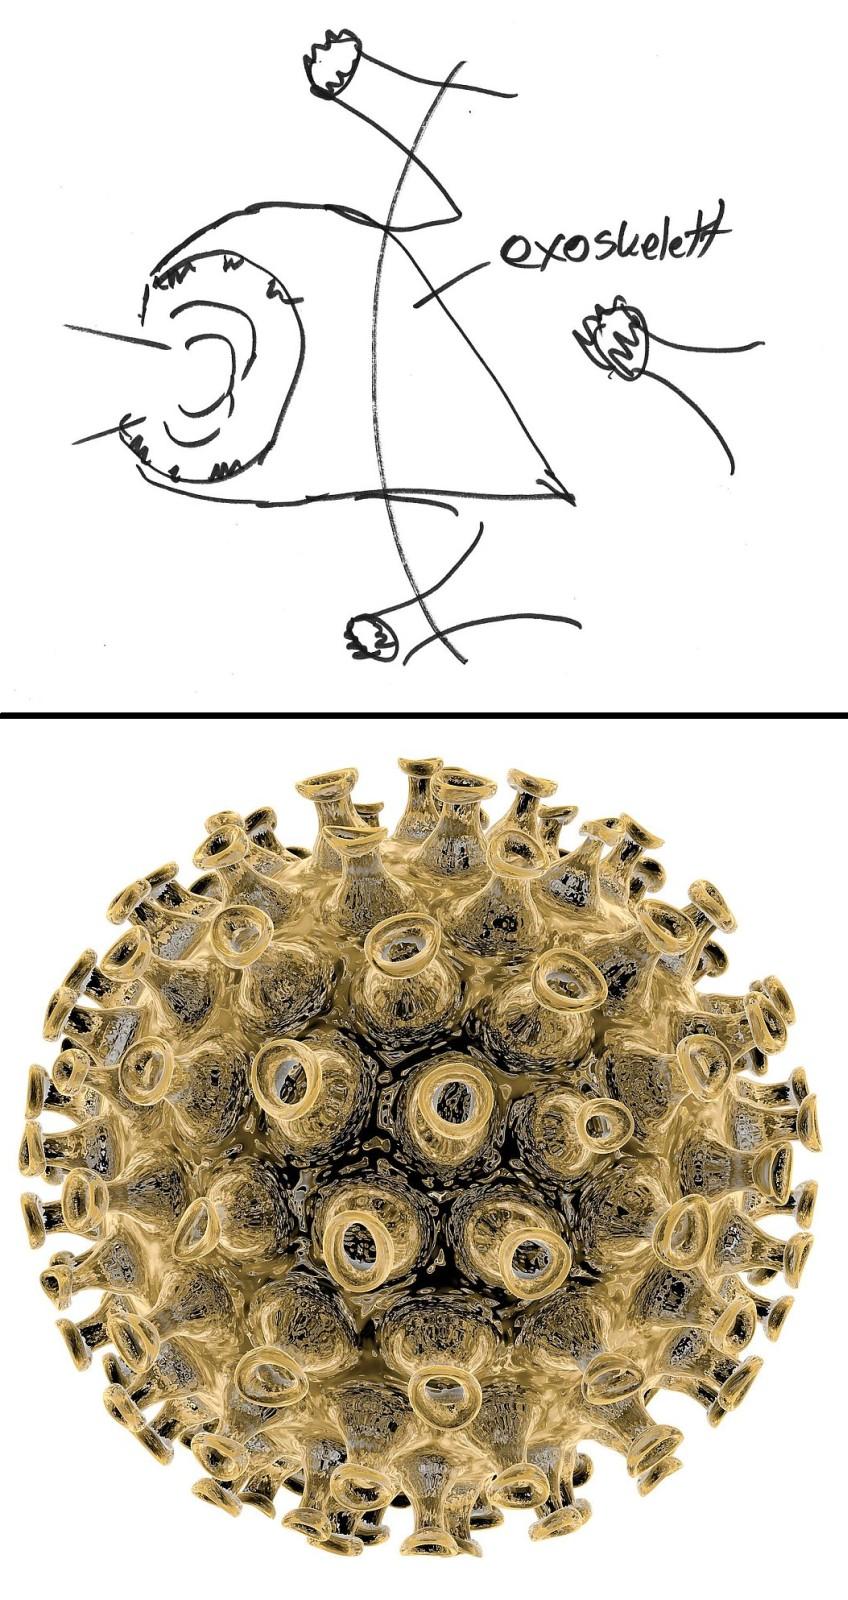 RV - Grippevirus